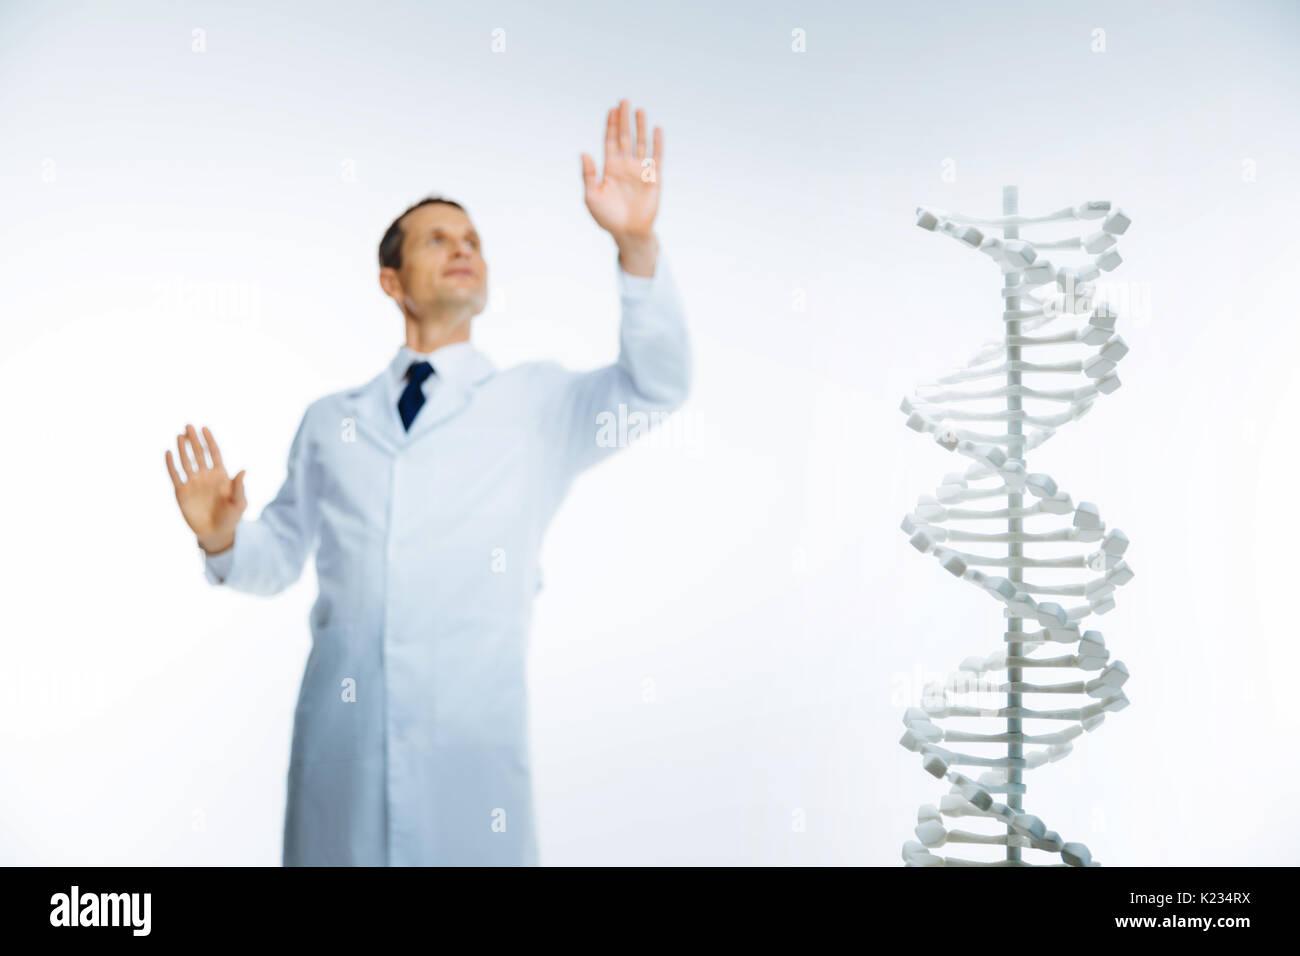 Male scientist studying genetics alone - Stock Image